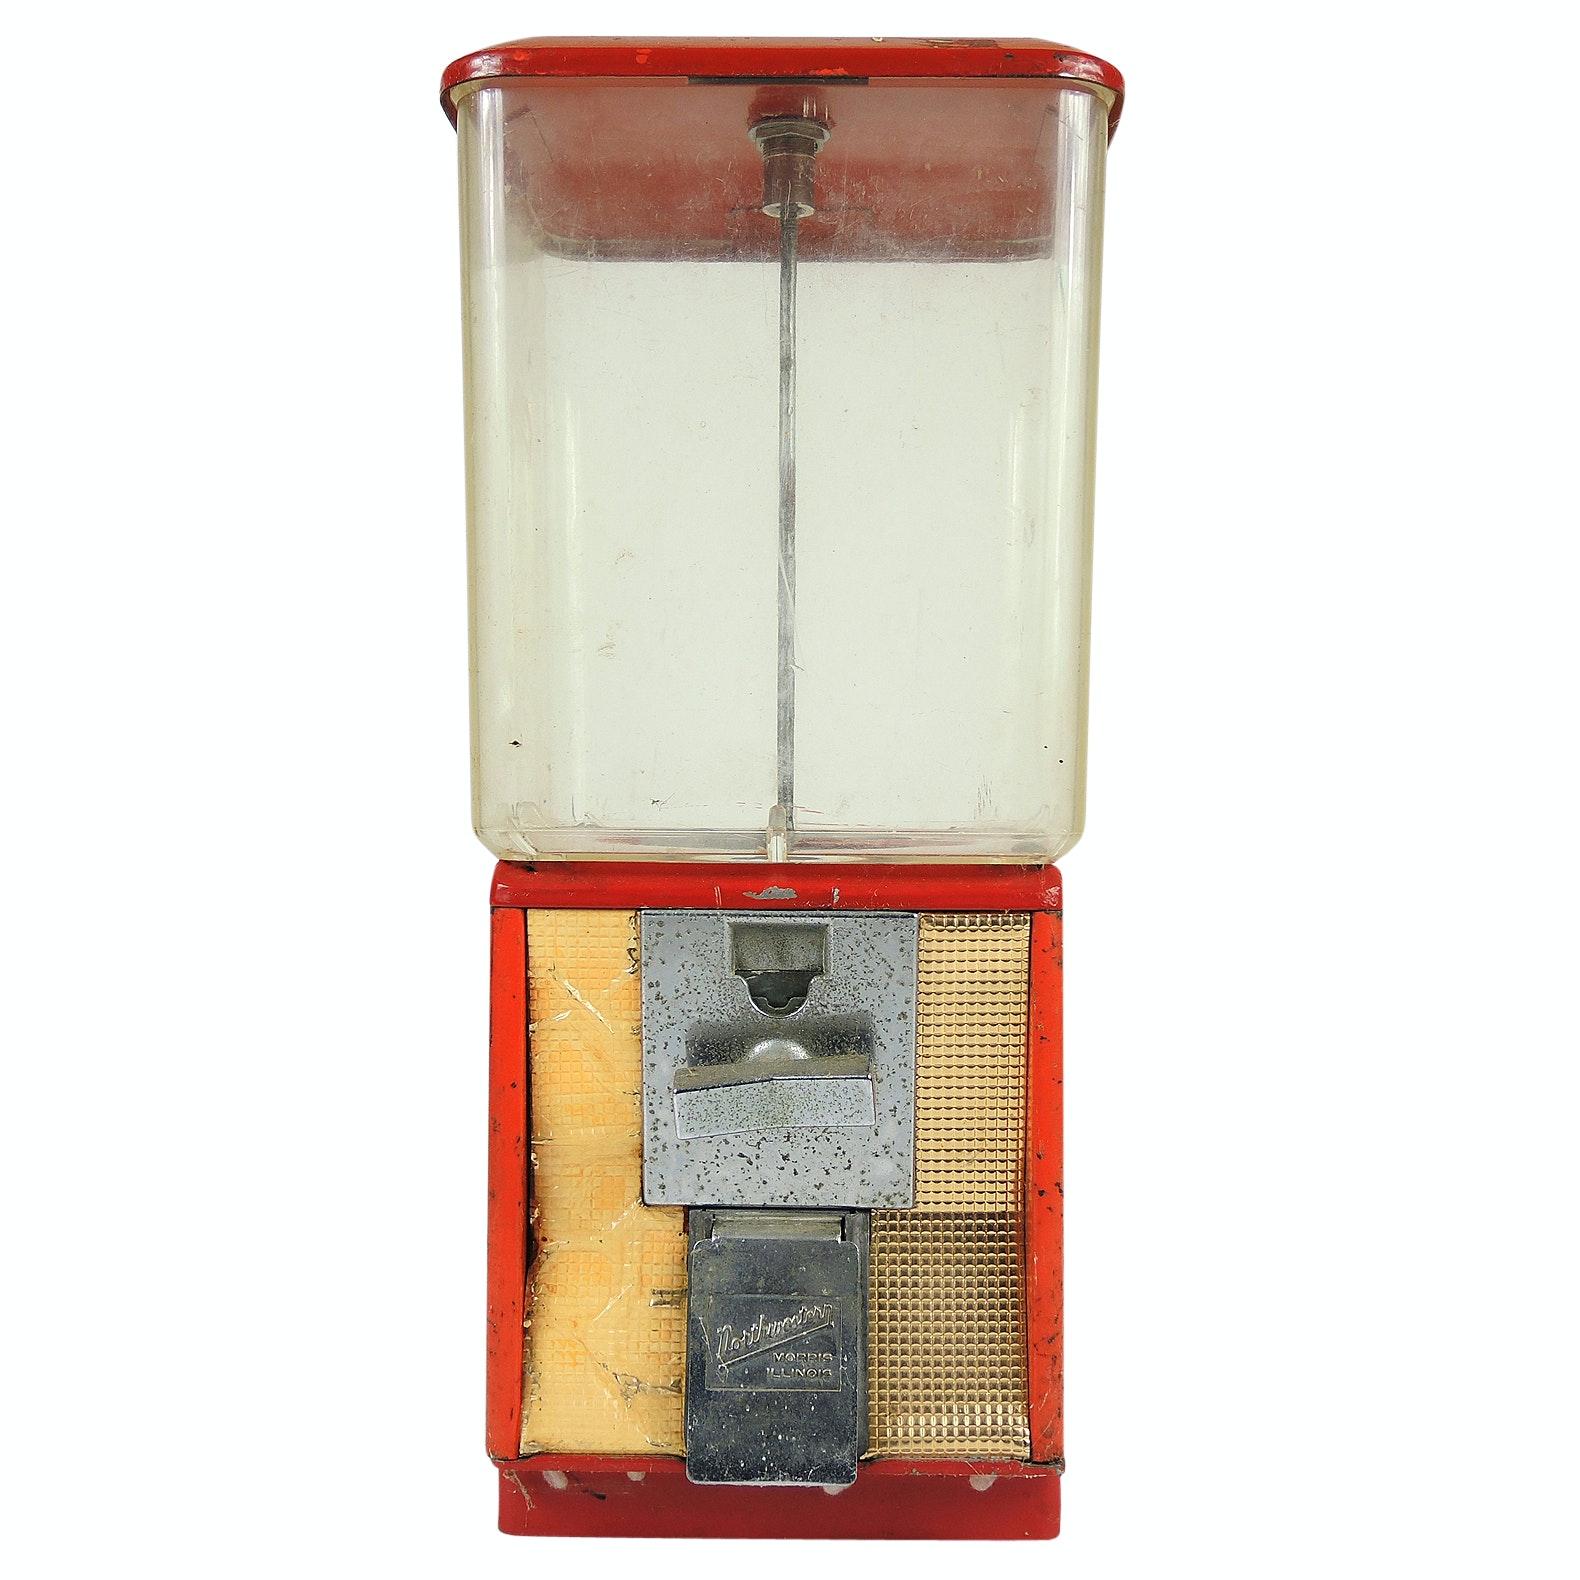 Northwestern Peanut Machine